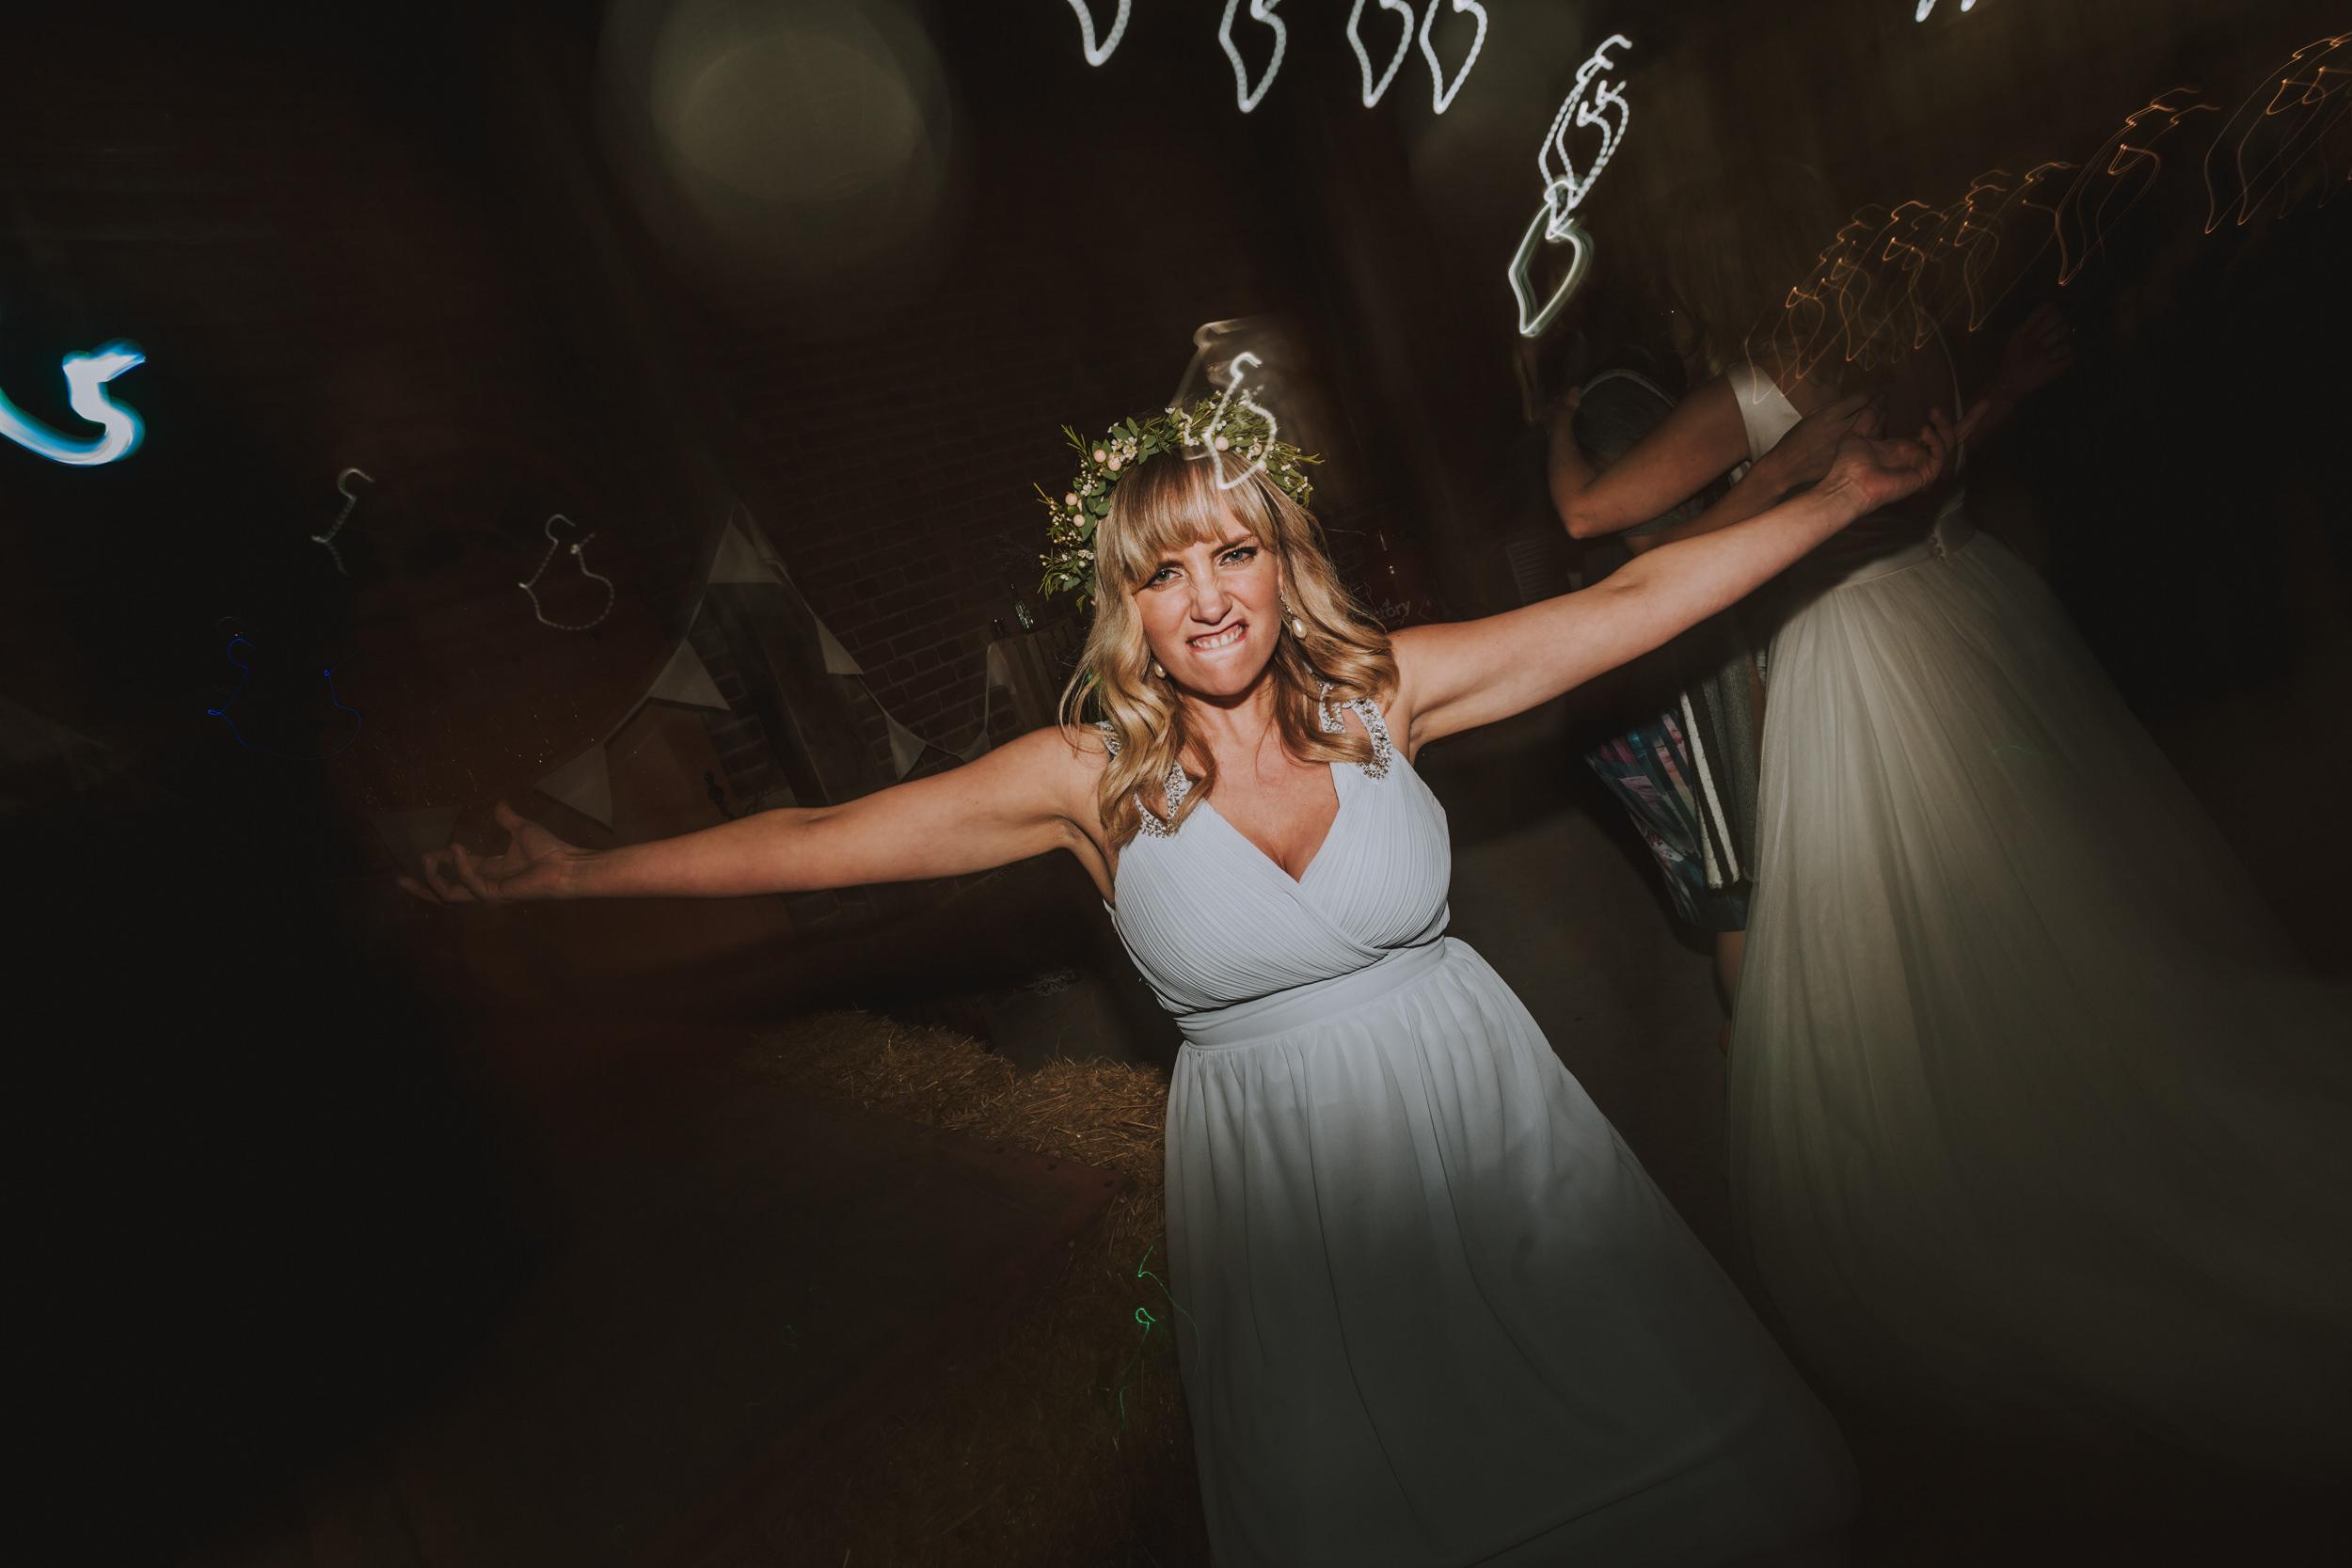 sledmere house wedding photographer venue yorkshire-75.jpg